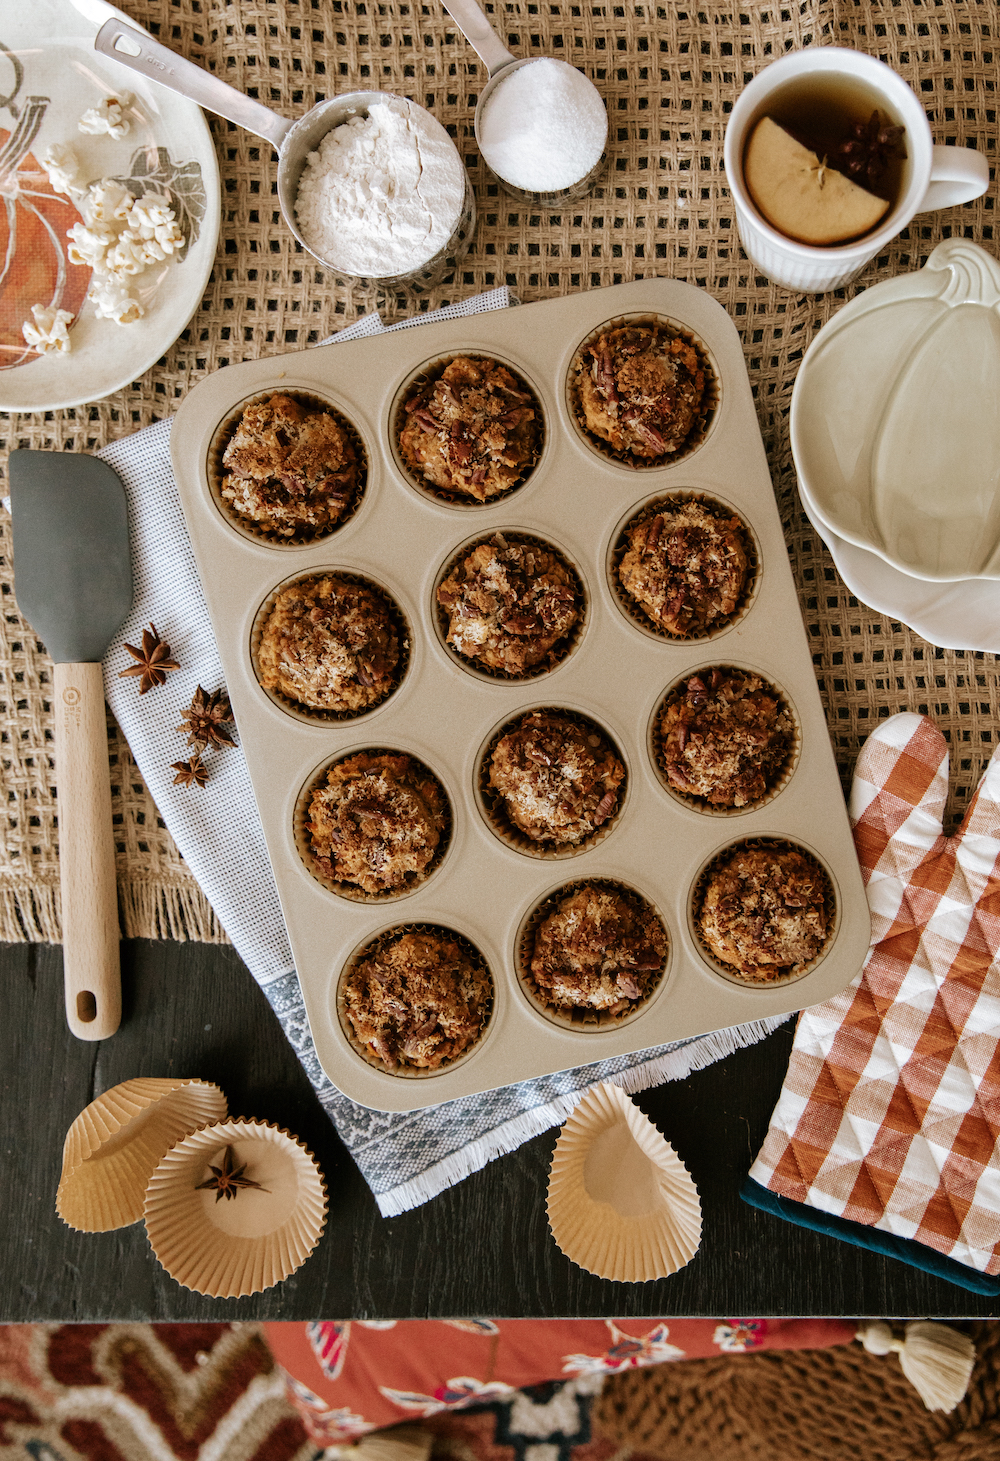 make muffins to celebrate fall!